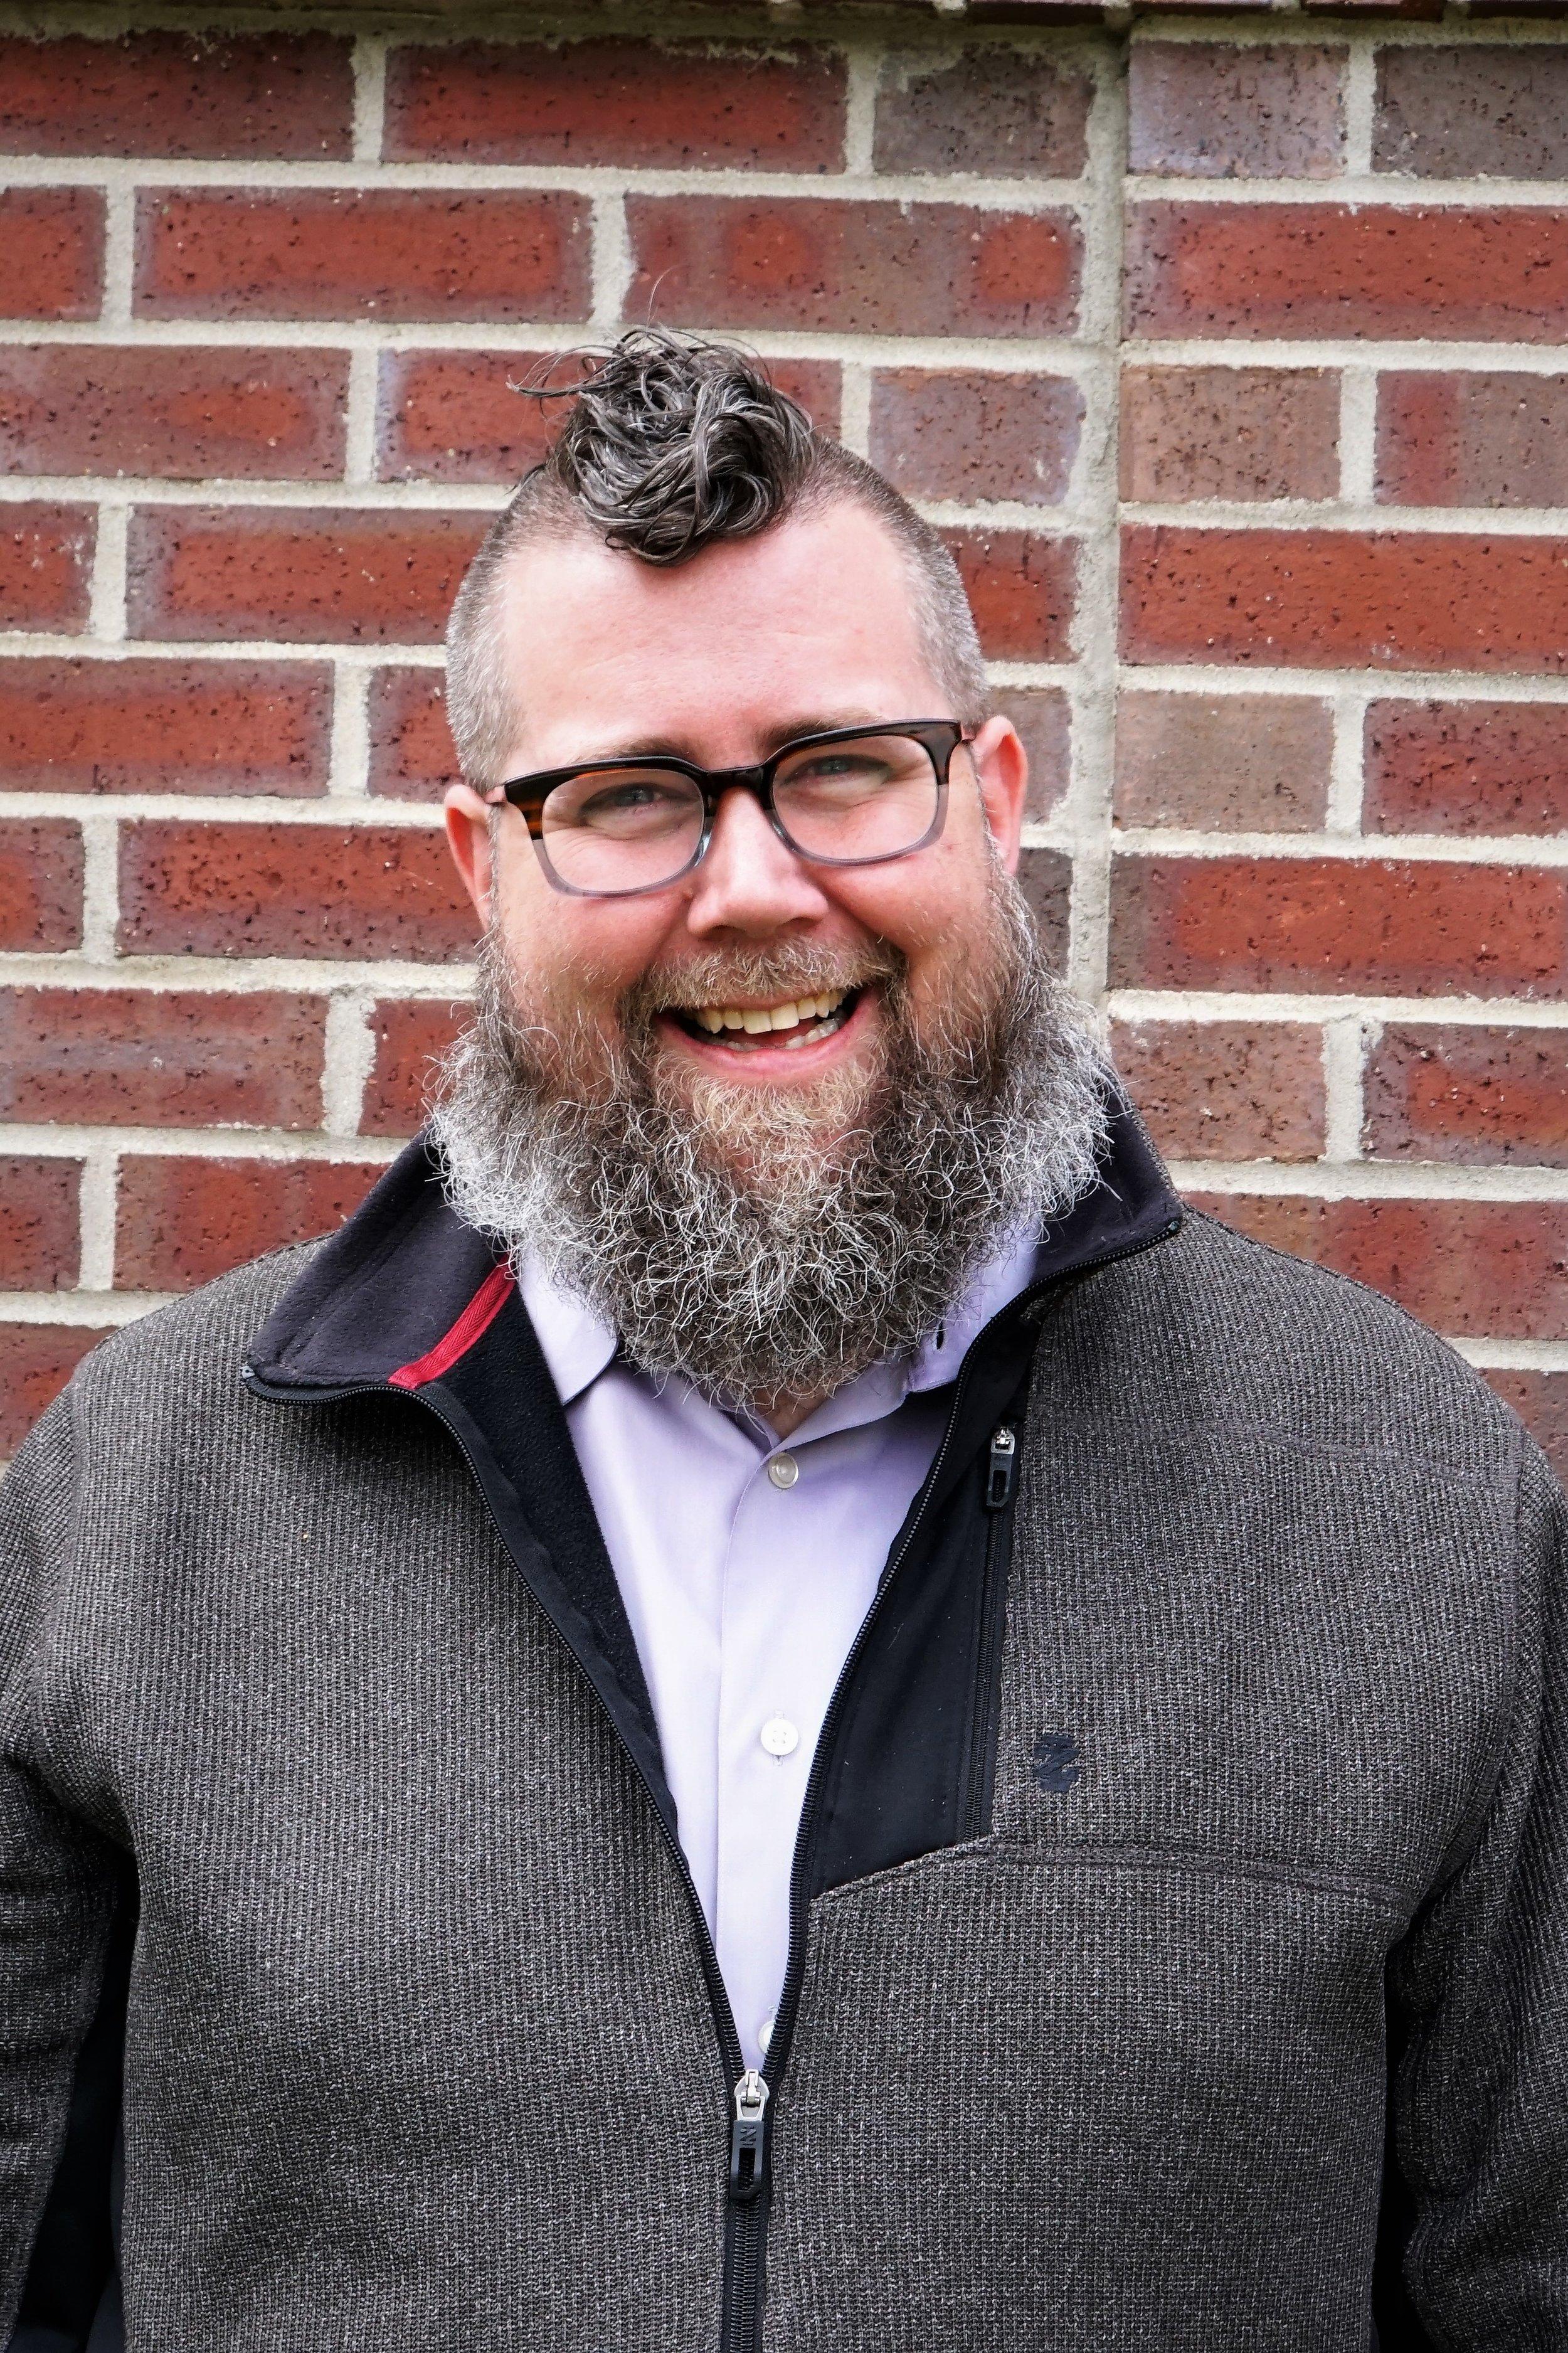 Aaron Eckhardt, Executive Director, BRAVO (Buckeye Region Anti-Violence Organization)